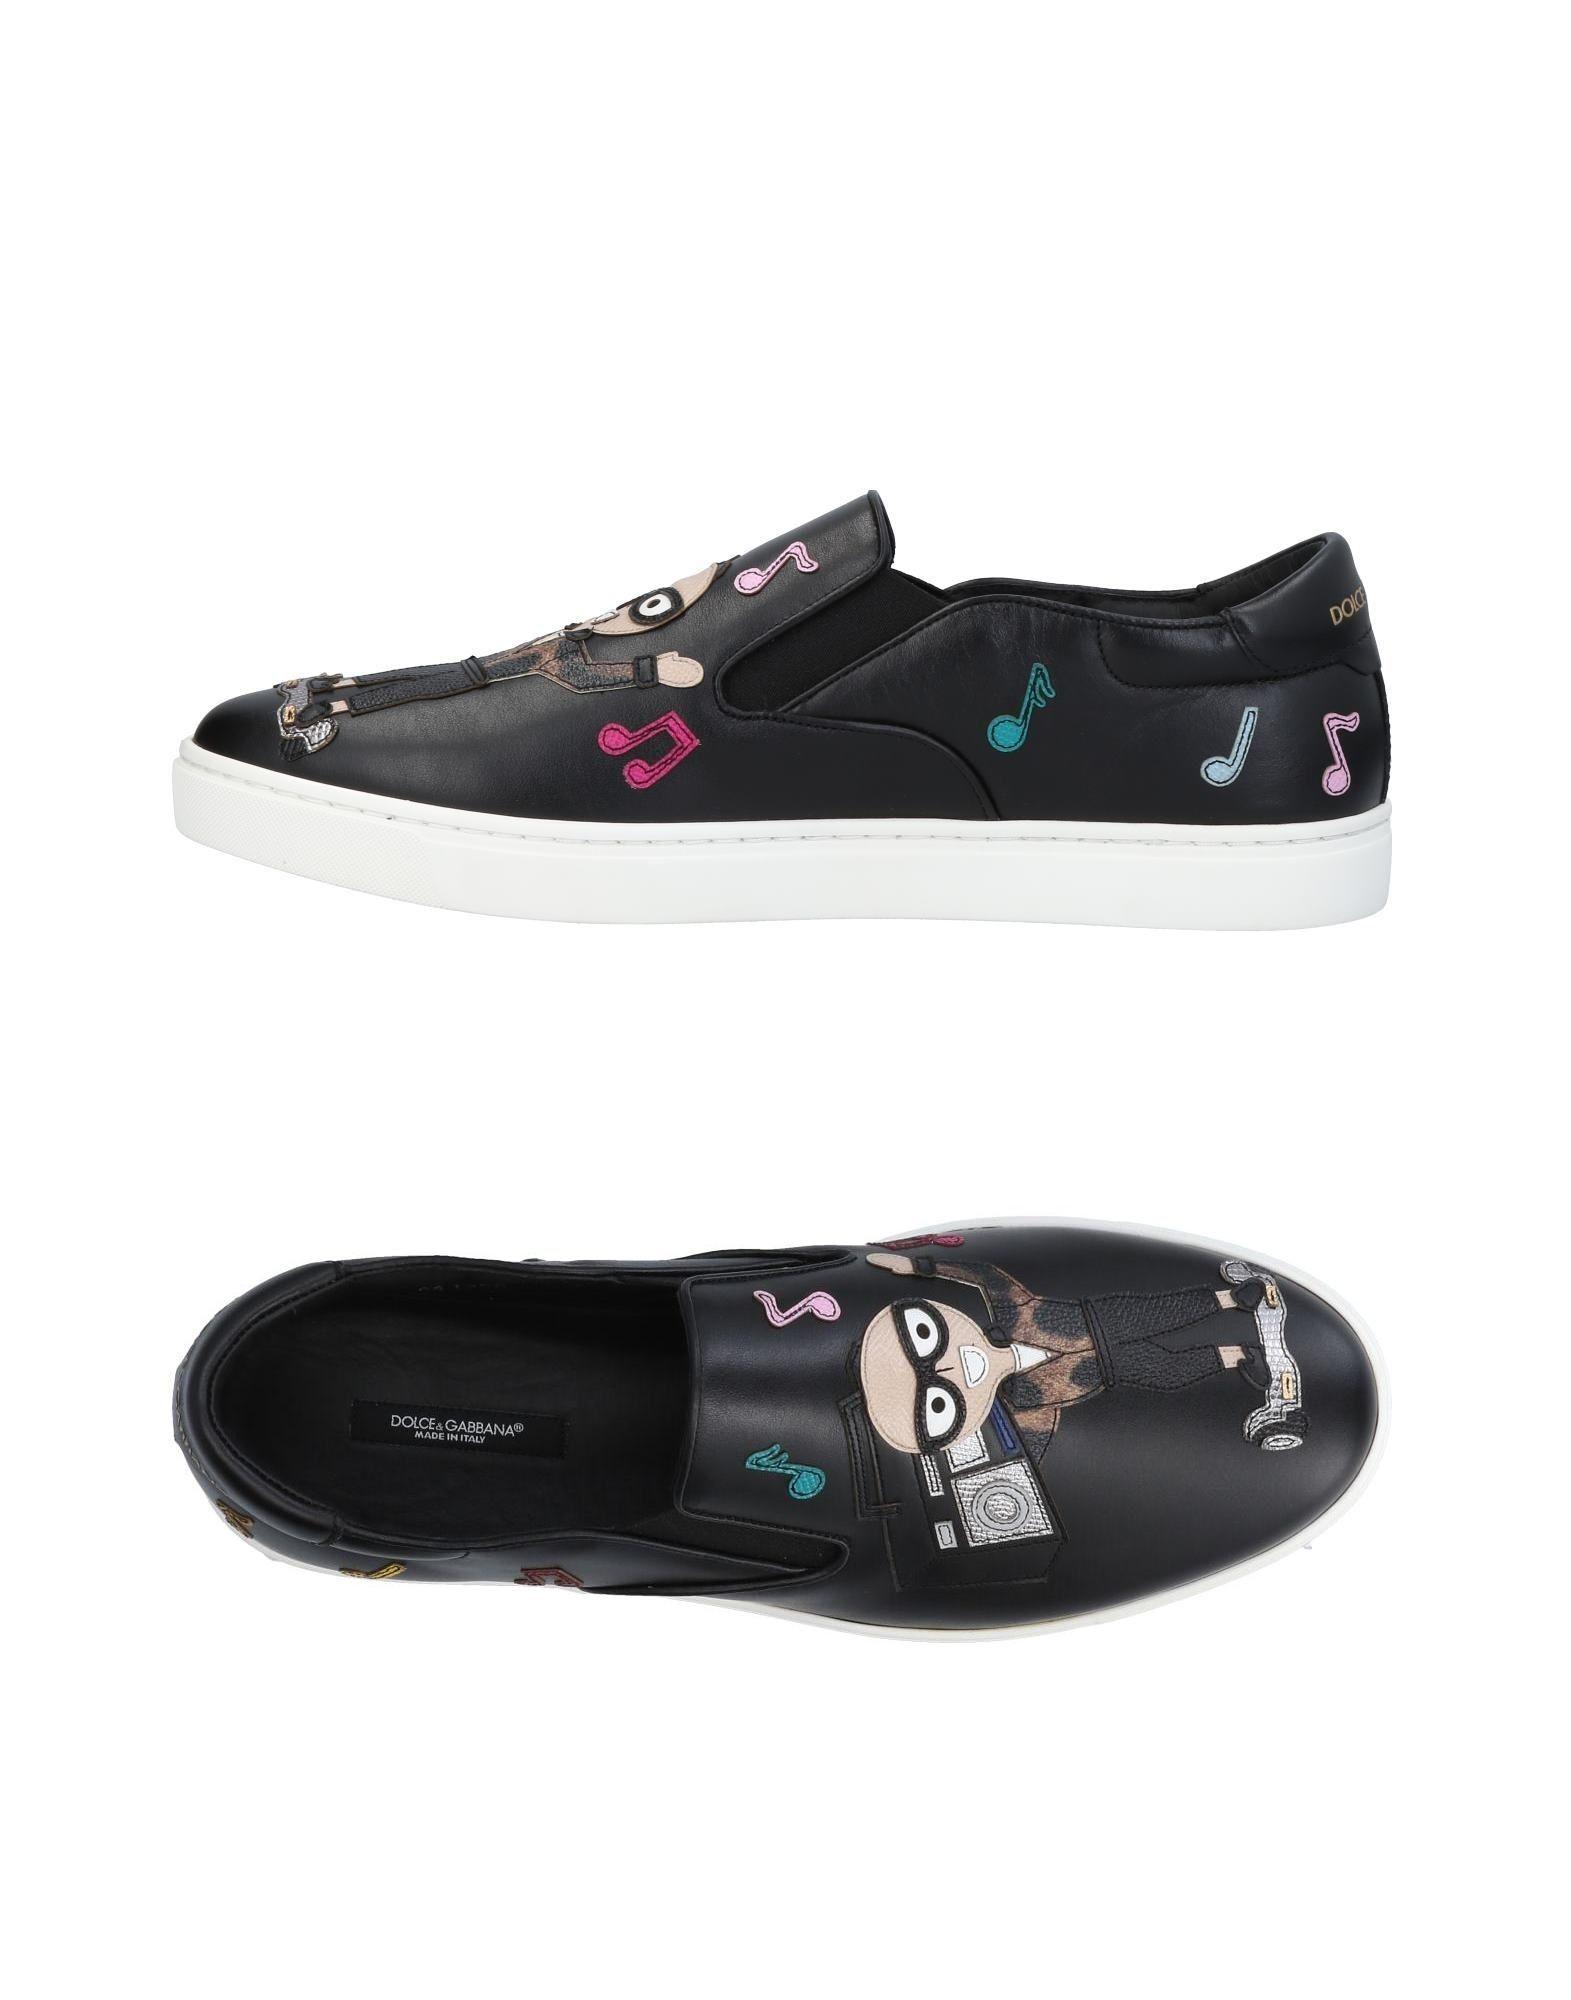 Dolce & Gabbana Sneakers Herren  11453599TW Gute Qualität beliebte Schuhe